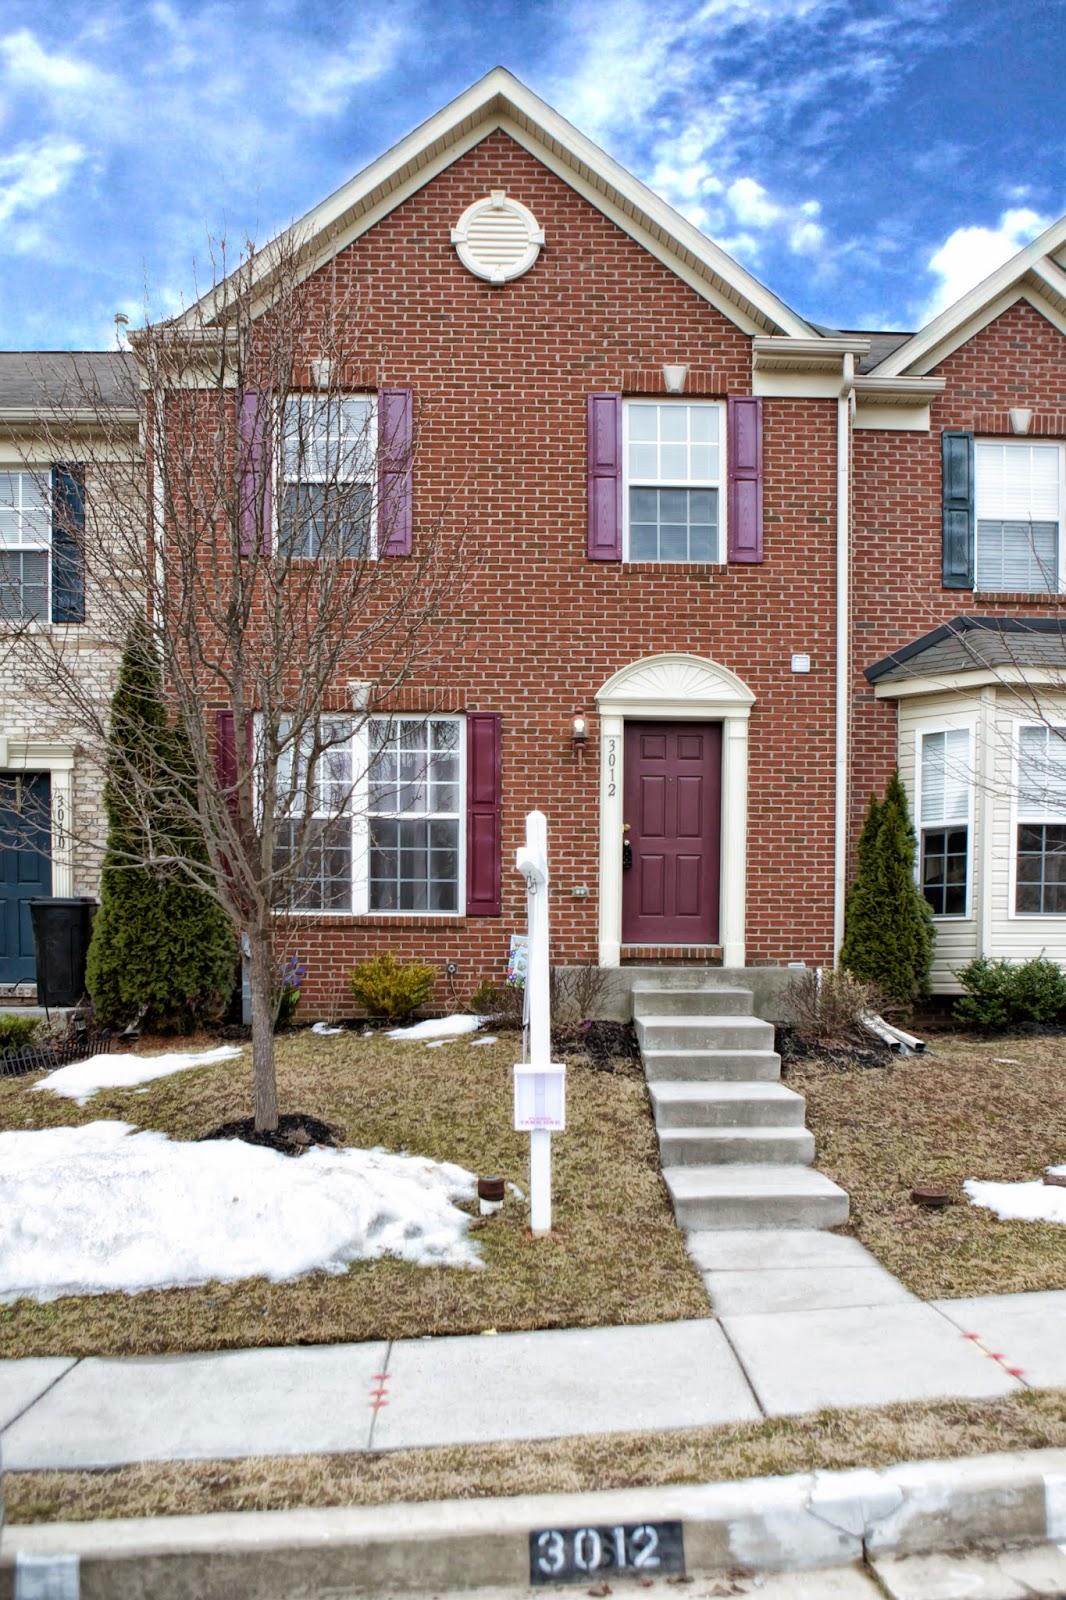 http://www.buy-sellmdhomes.com/listing/mlsid/161/propertyid/HR8346598/